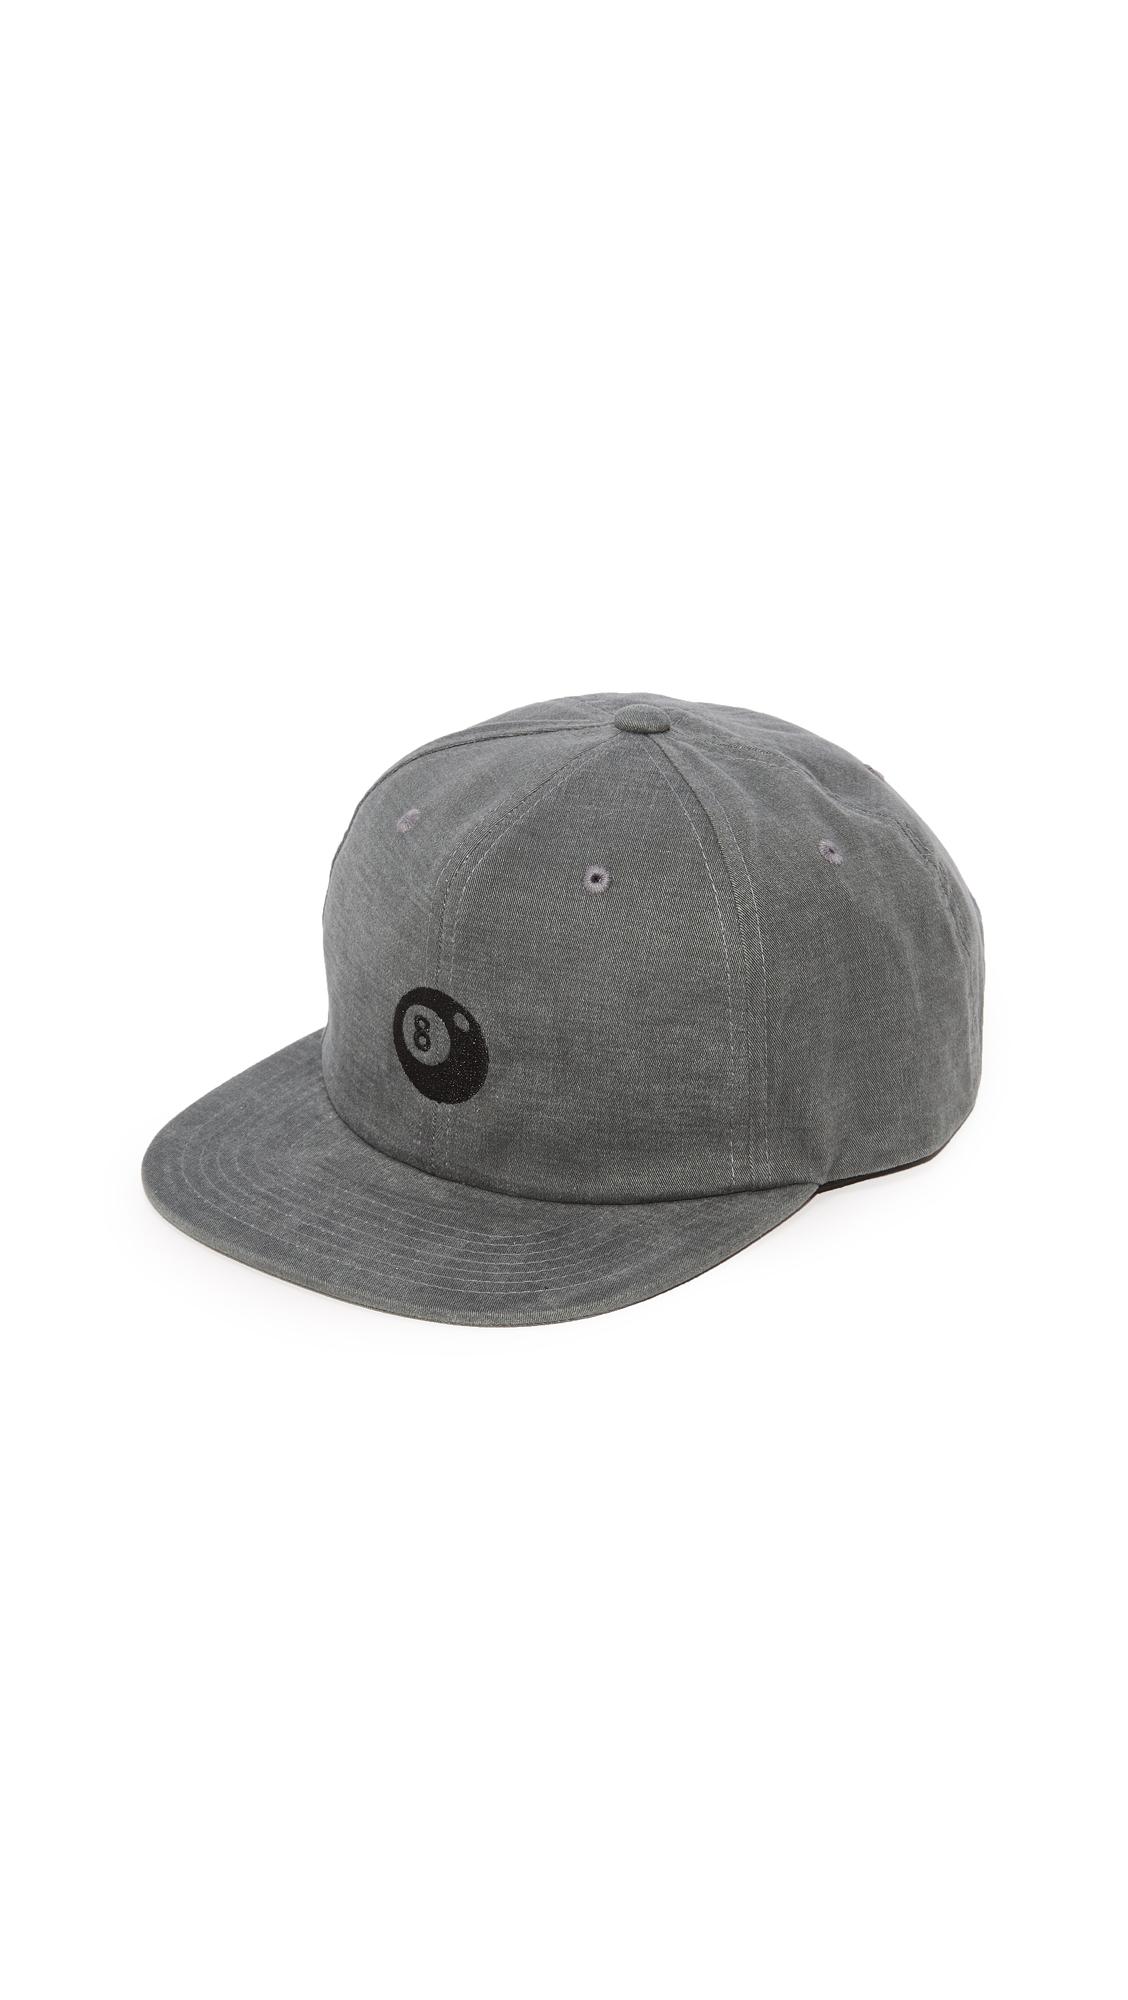 f8db6b45d81 Stussy Men s Hats and Caps